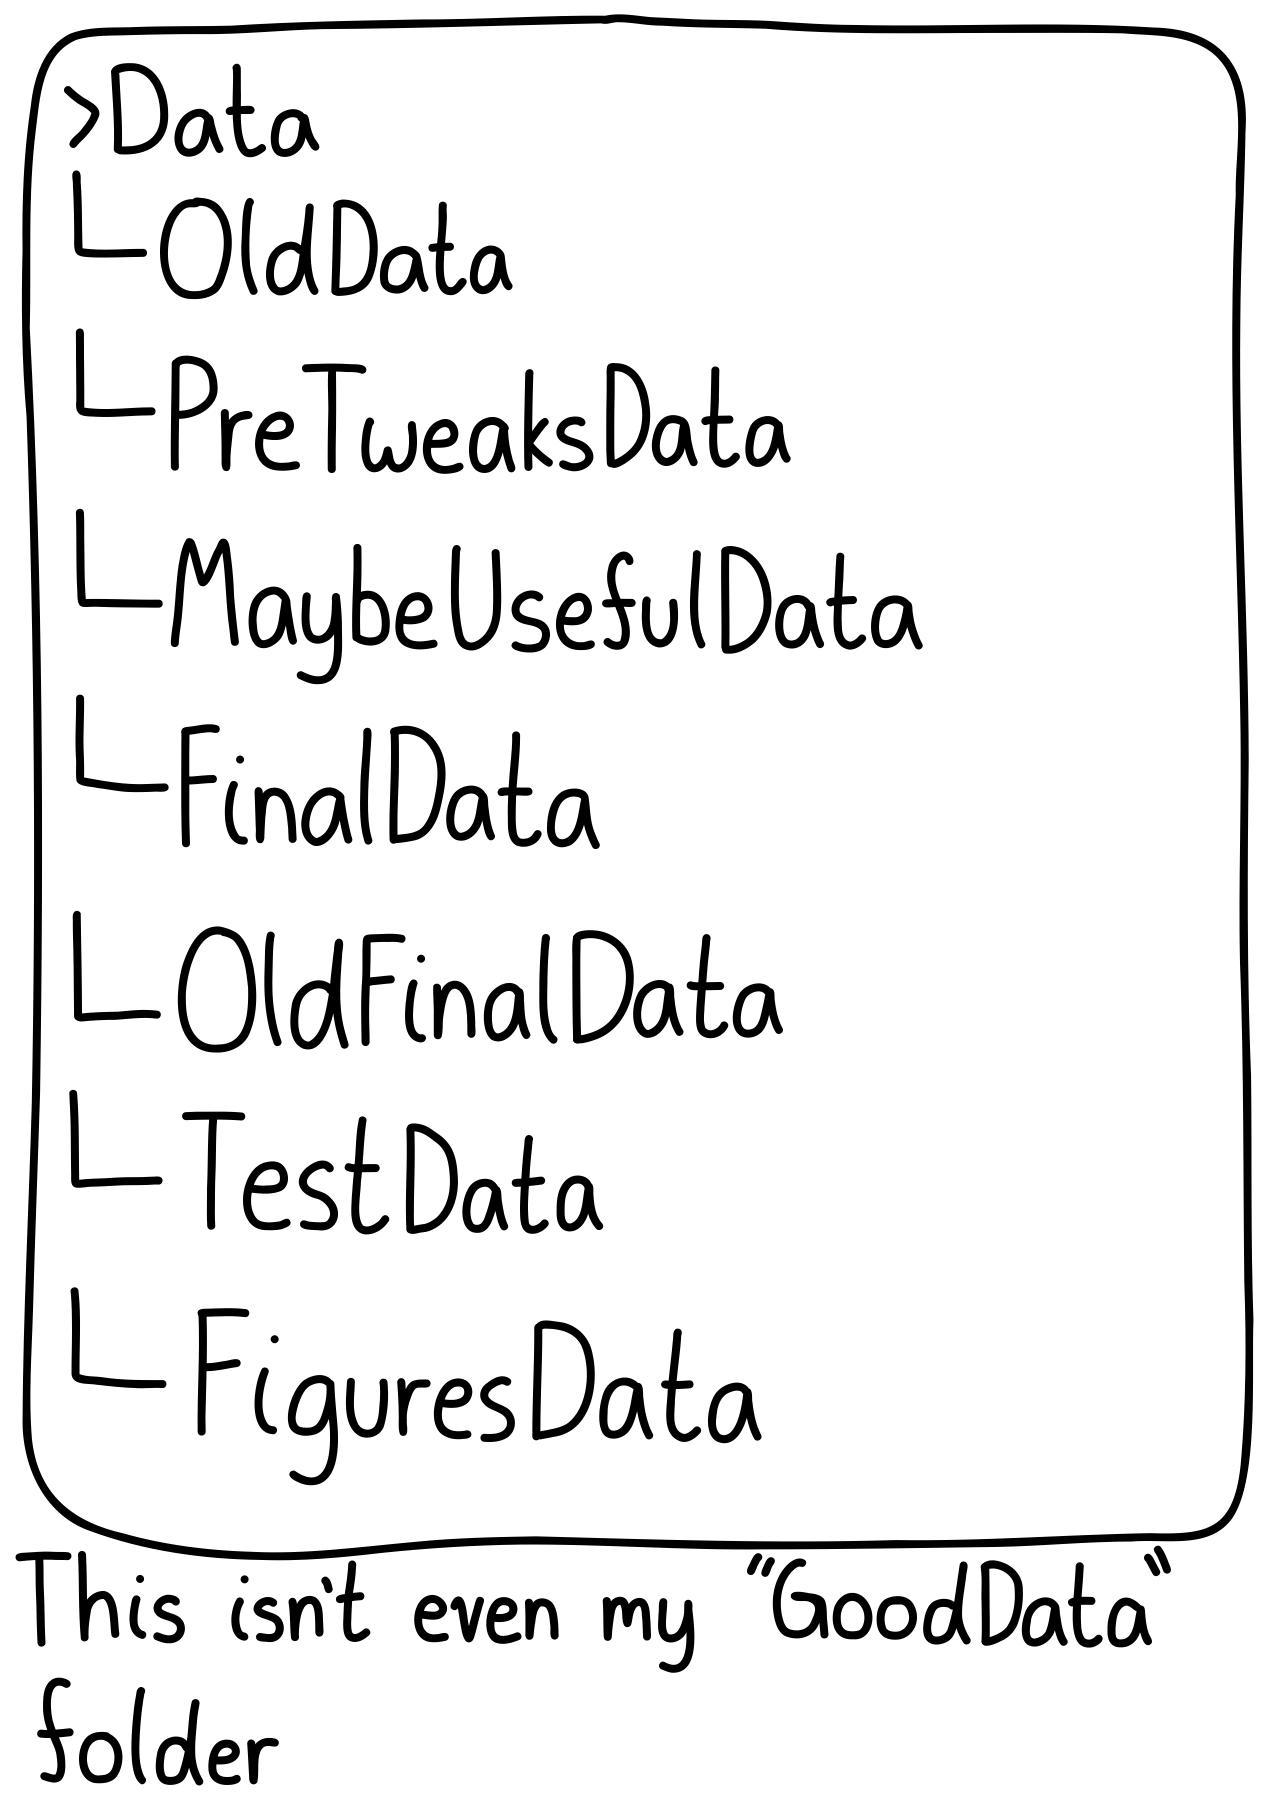 The folder structure for my data. It's a bunch of folders with very bad names: OldData, PreTweaksData, MaybeUsefulData, FinalData, OldFinalData, TestData, FiguresData.